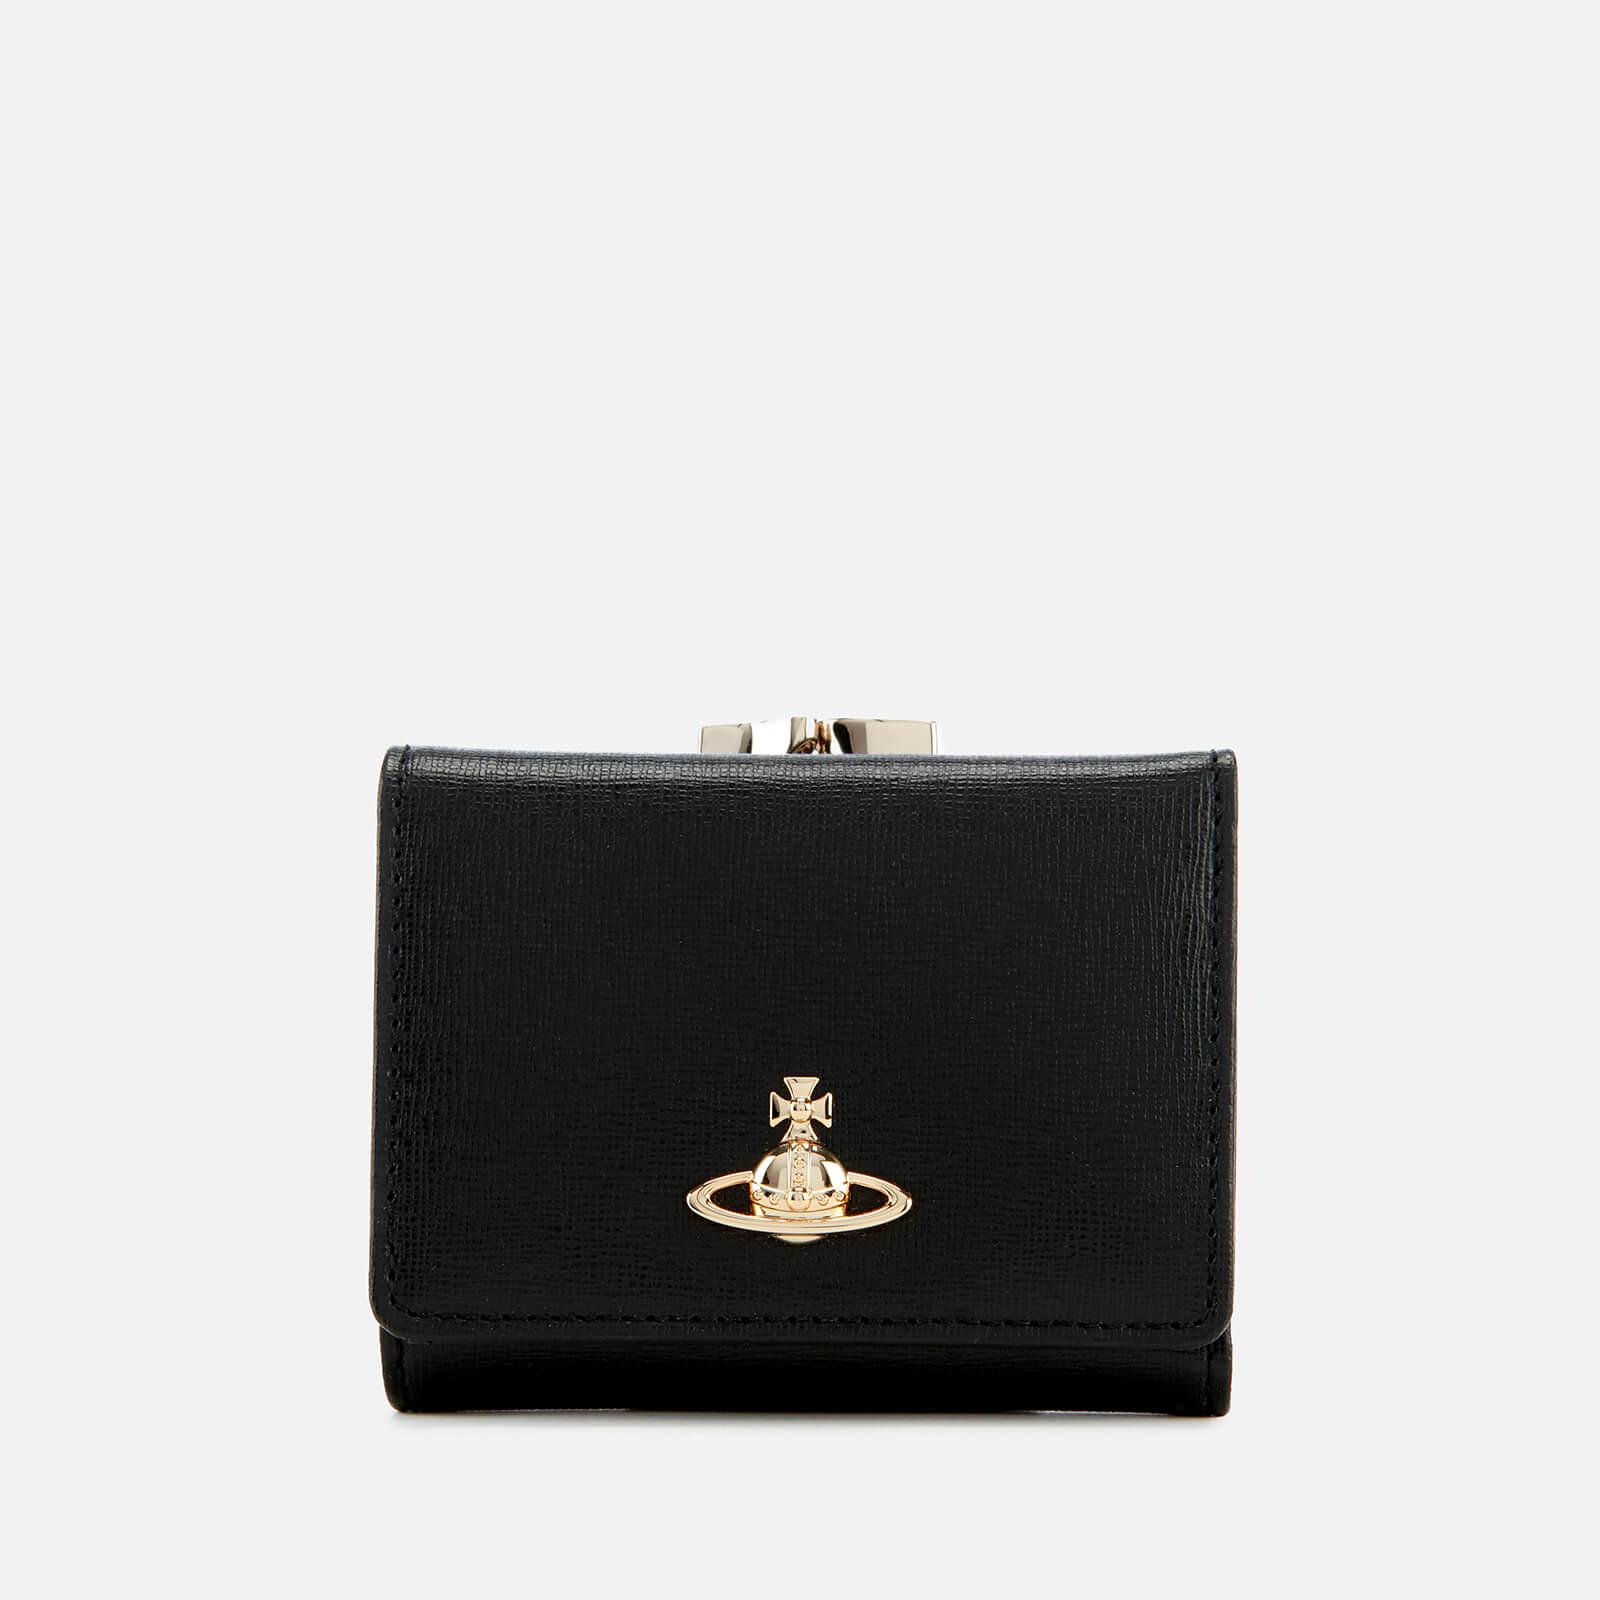 4ee3c551de89 Vivienne Westwood Women's Victoria Small Frame Wallet - Black